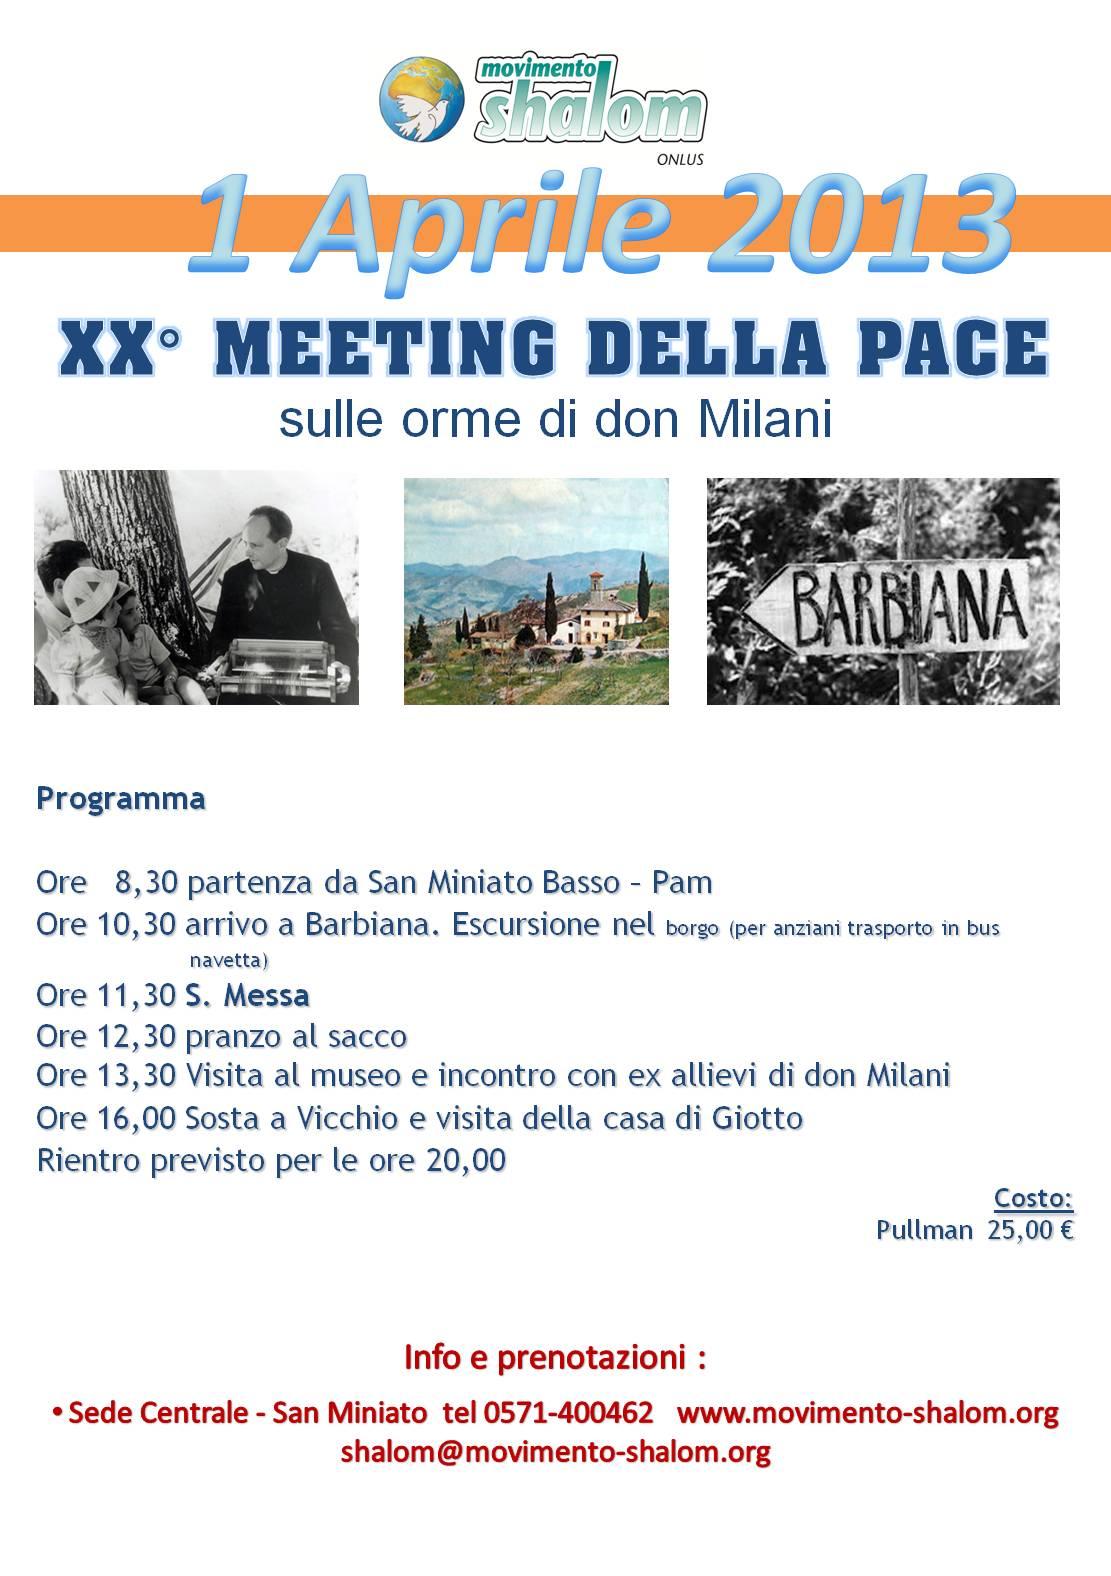 Barbiana: XX Meeting della Pace